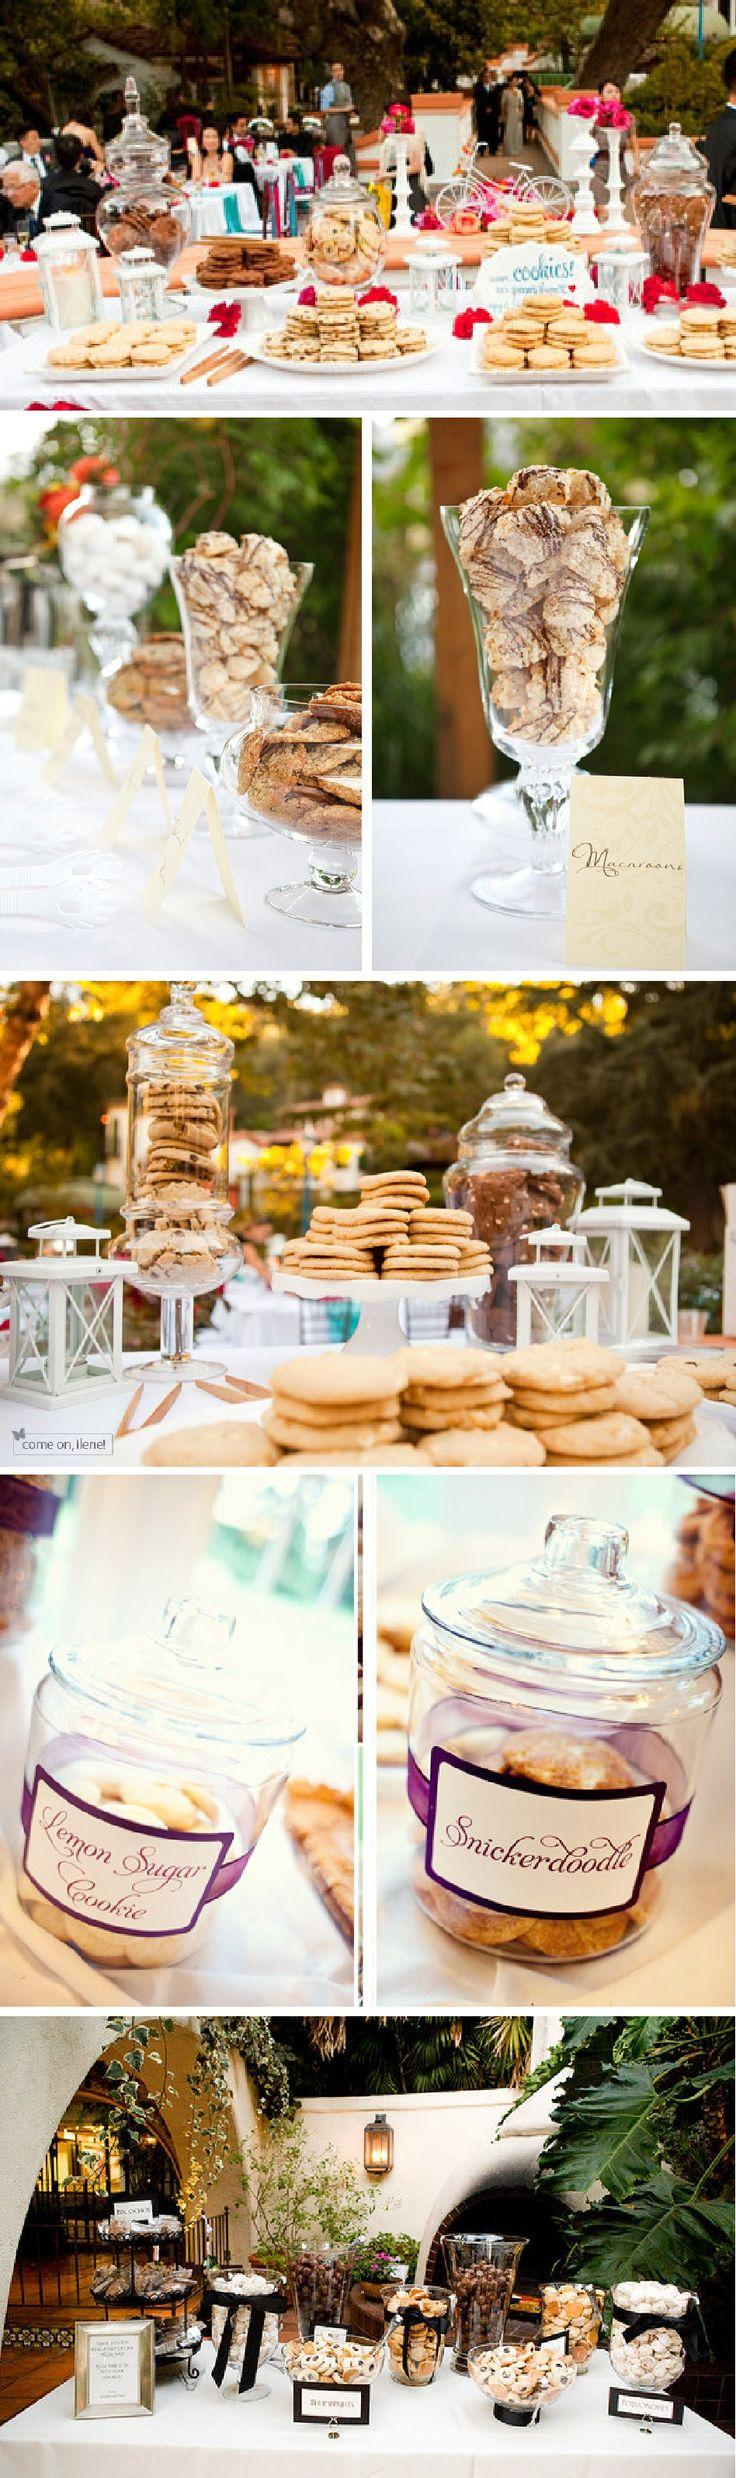 Свадьба - Drinks And Desserts Ideas